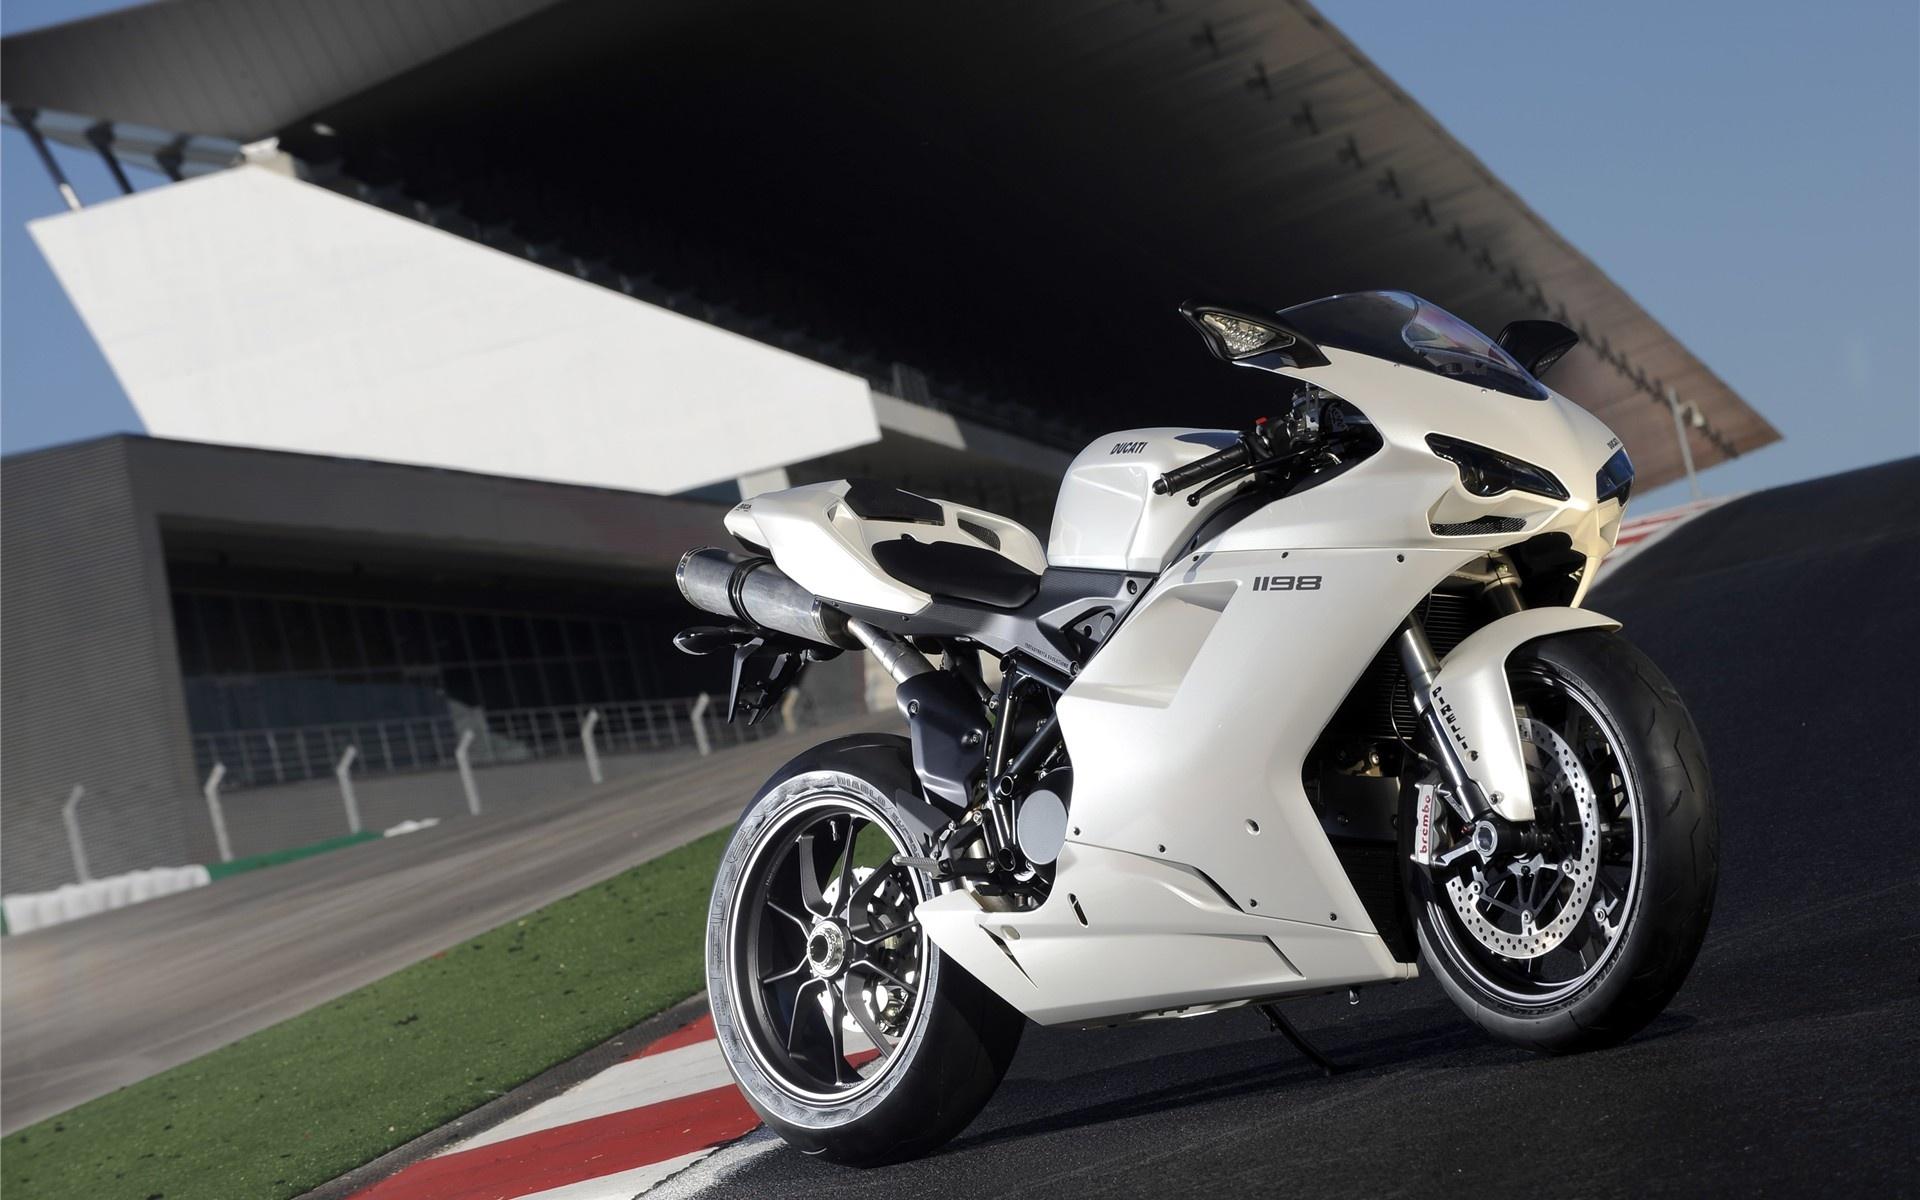 Fotos Ducati whateveryoucallthissite 1920x1200